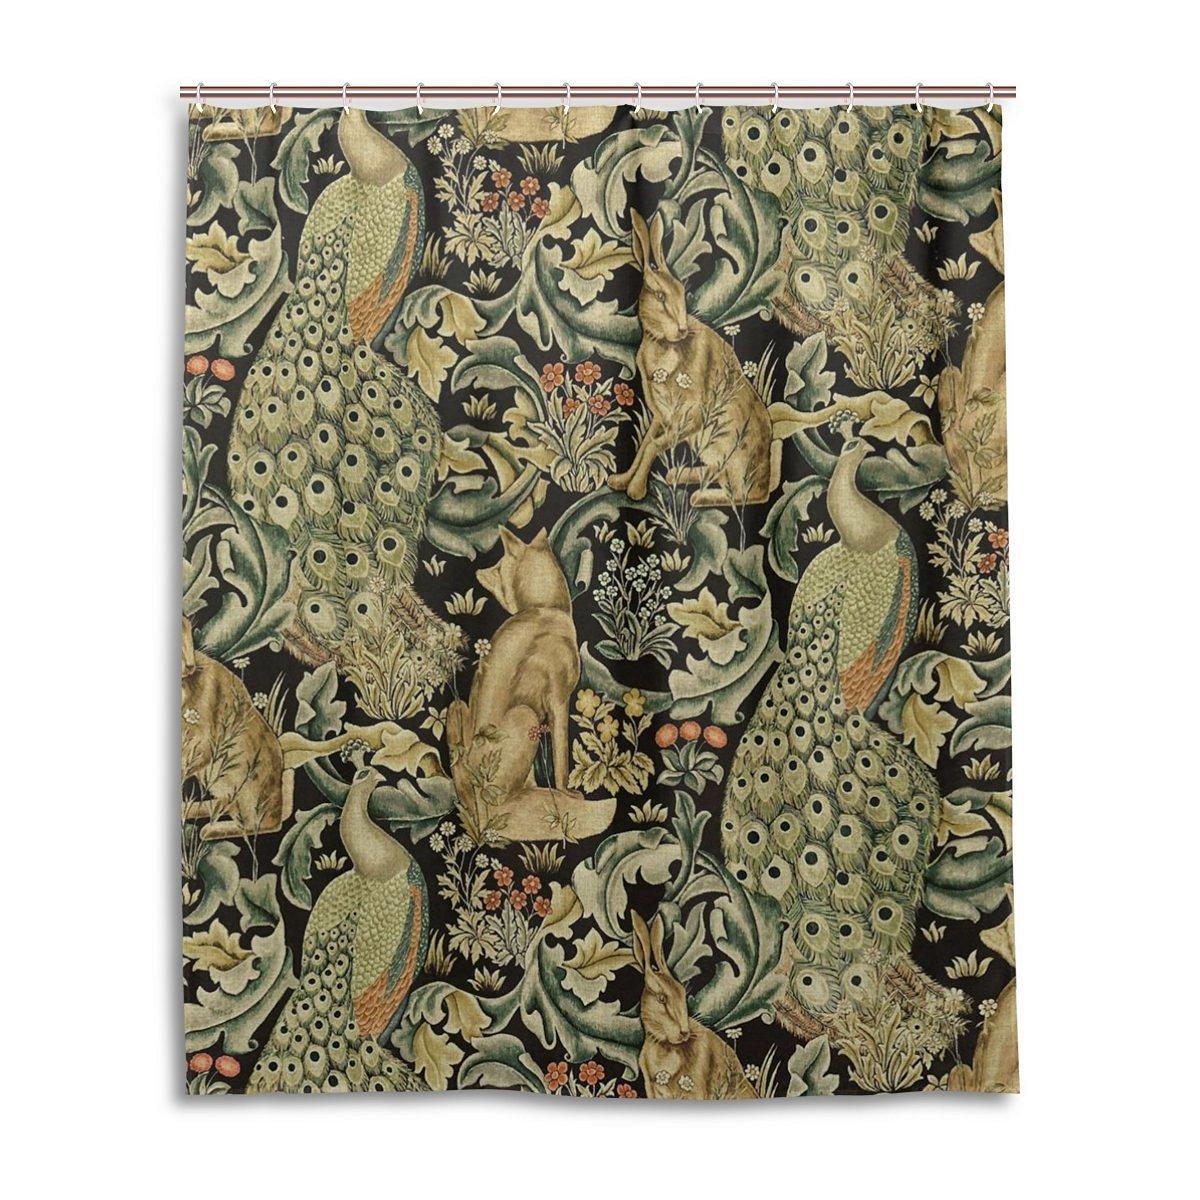 JSTEL Decor Shower Curtain William Morris Peacock Prints Pattern Print 100 Polyester Fabric